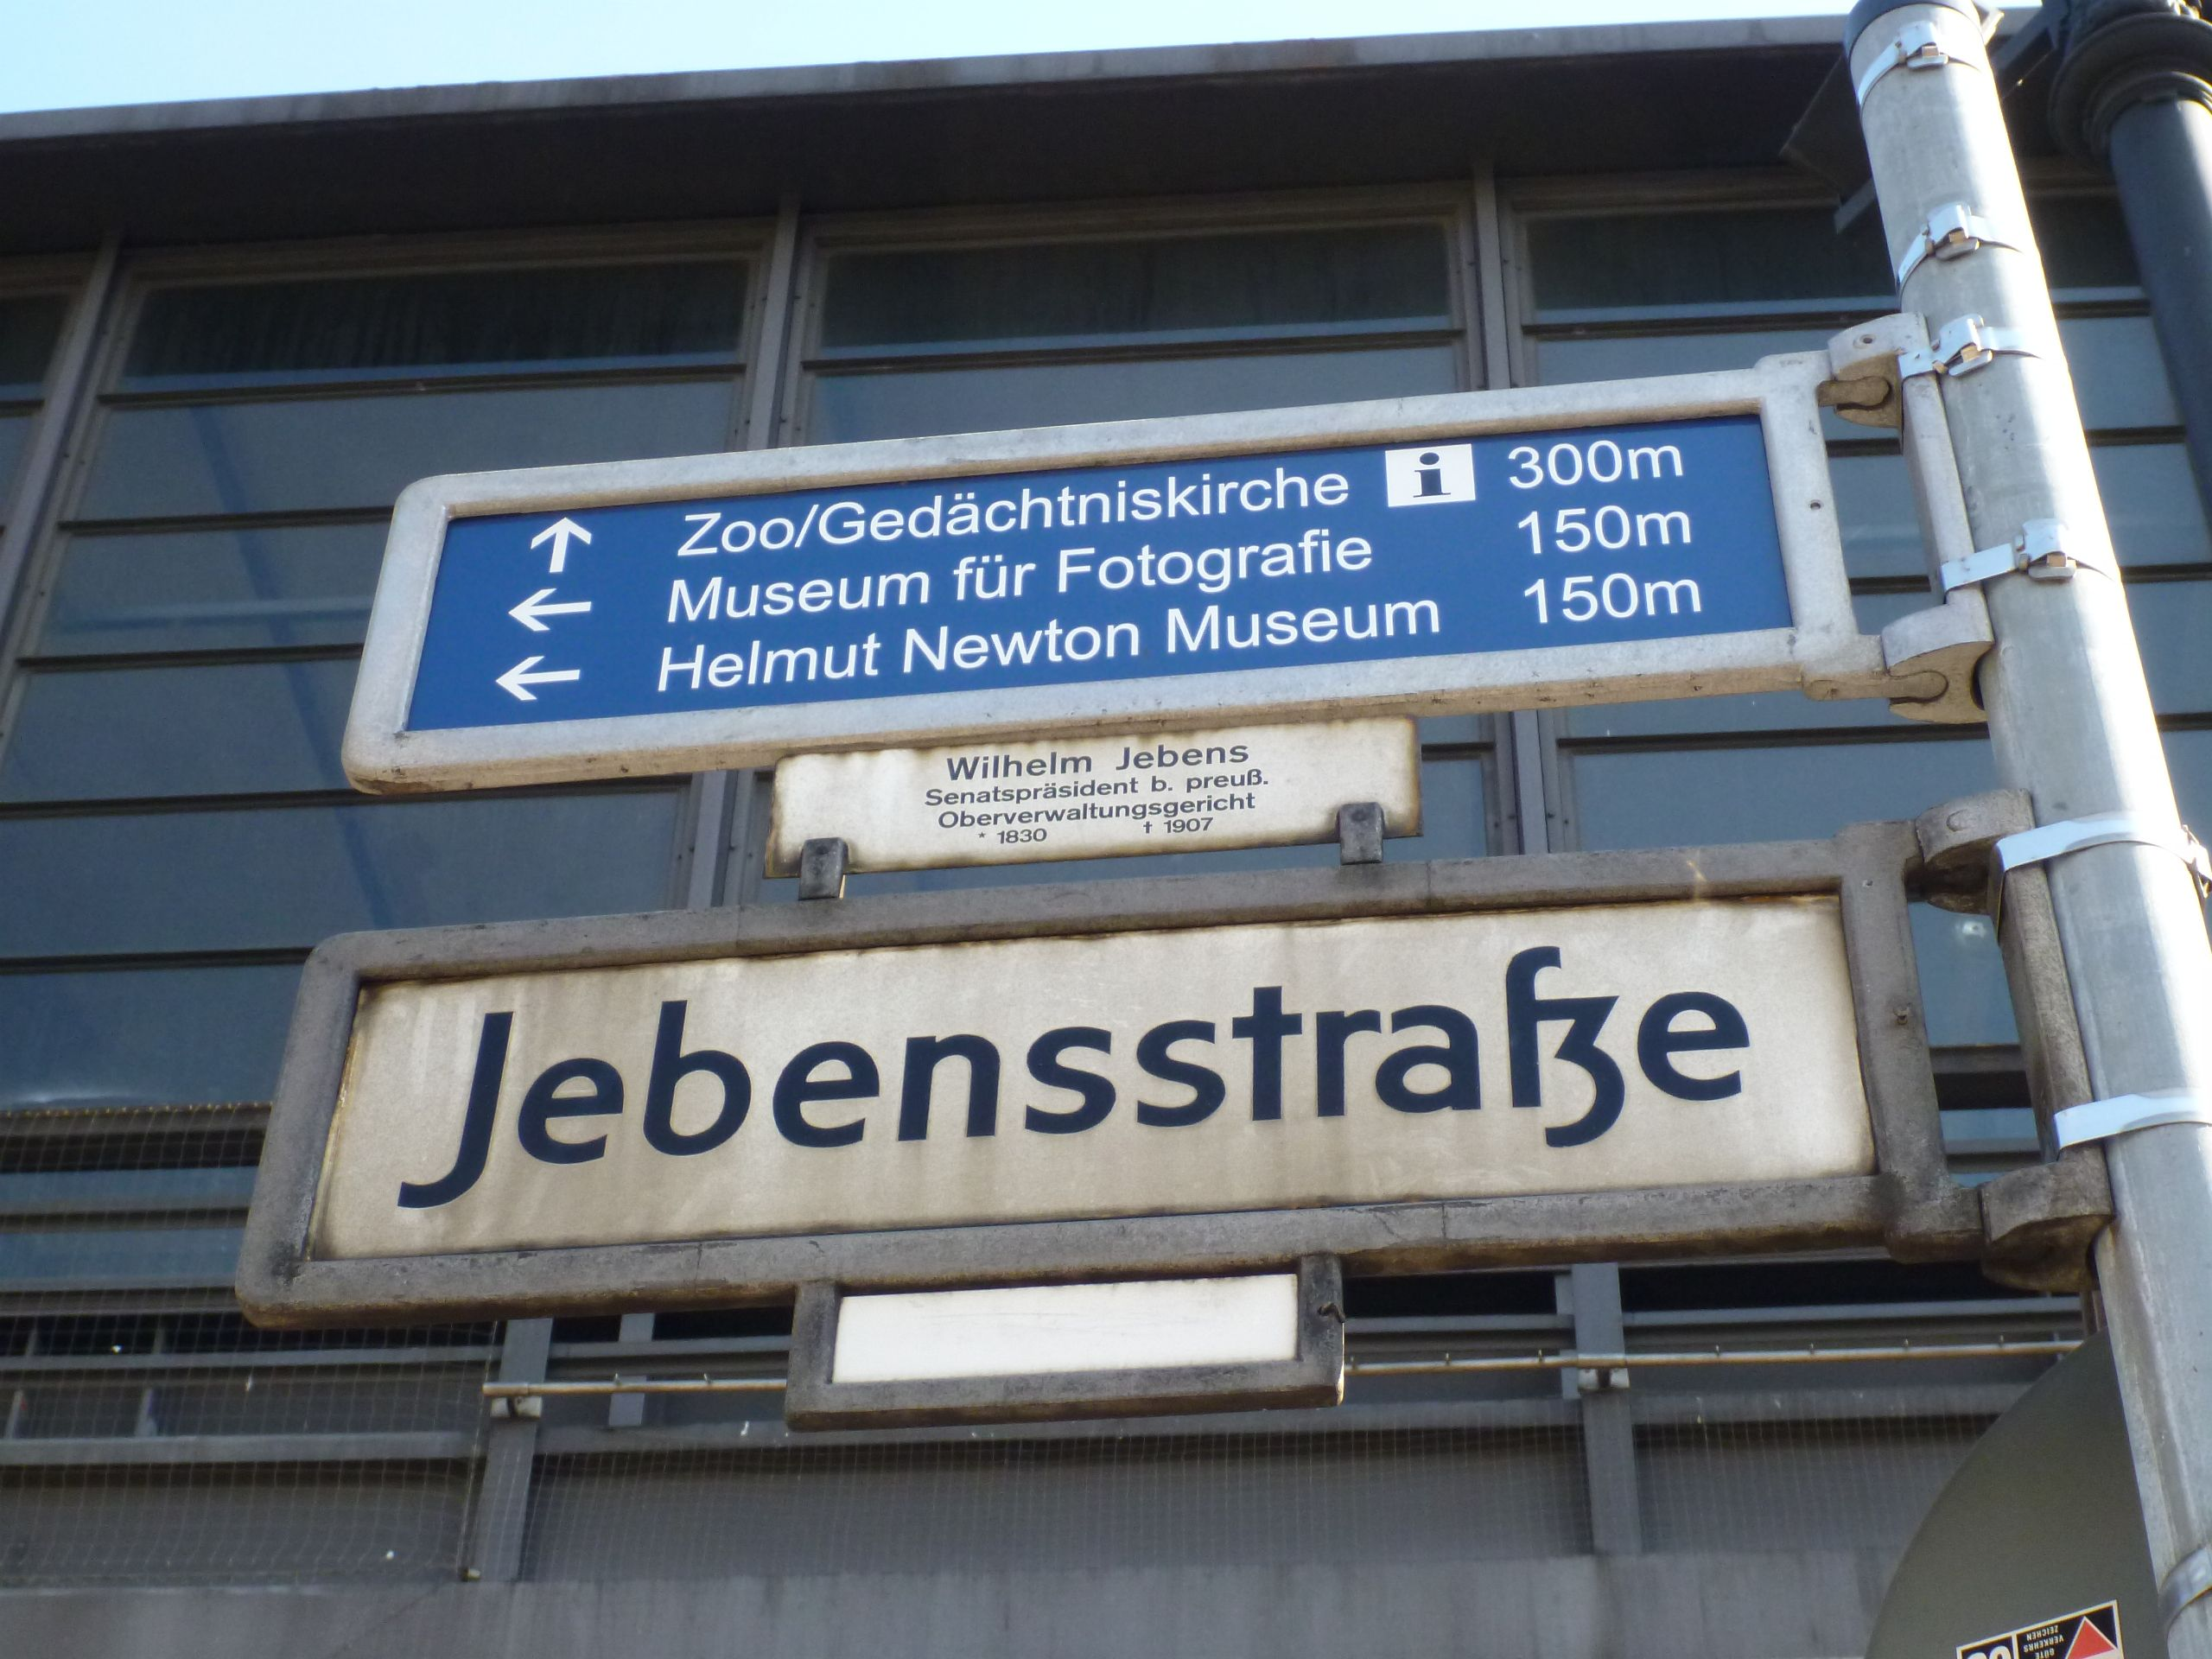 Jebensstrasse